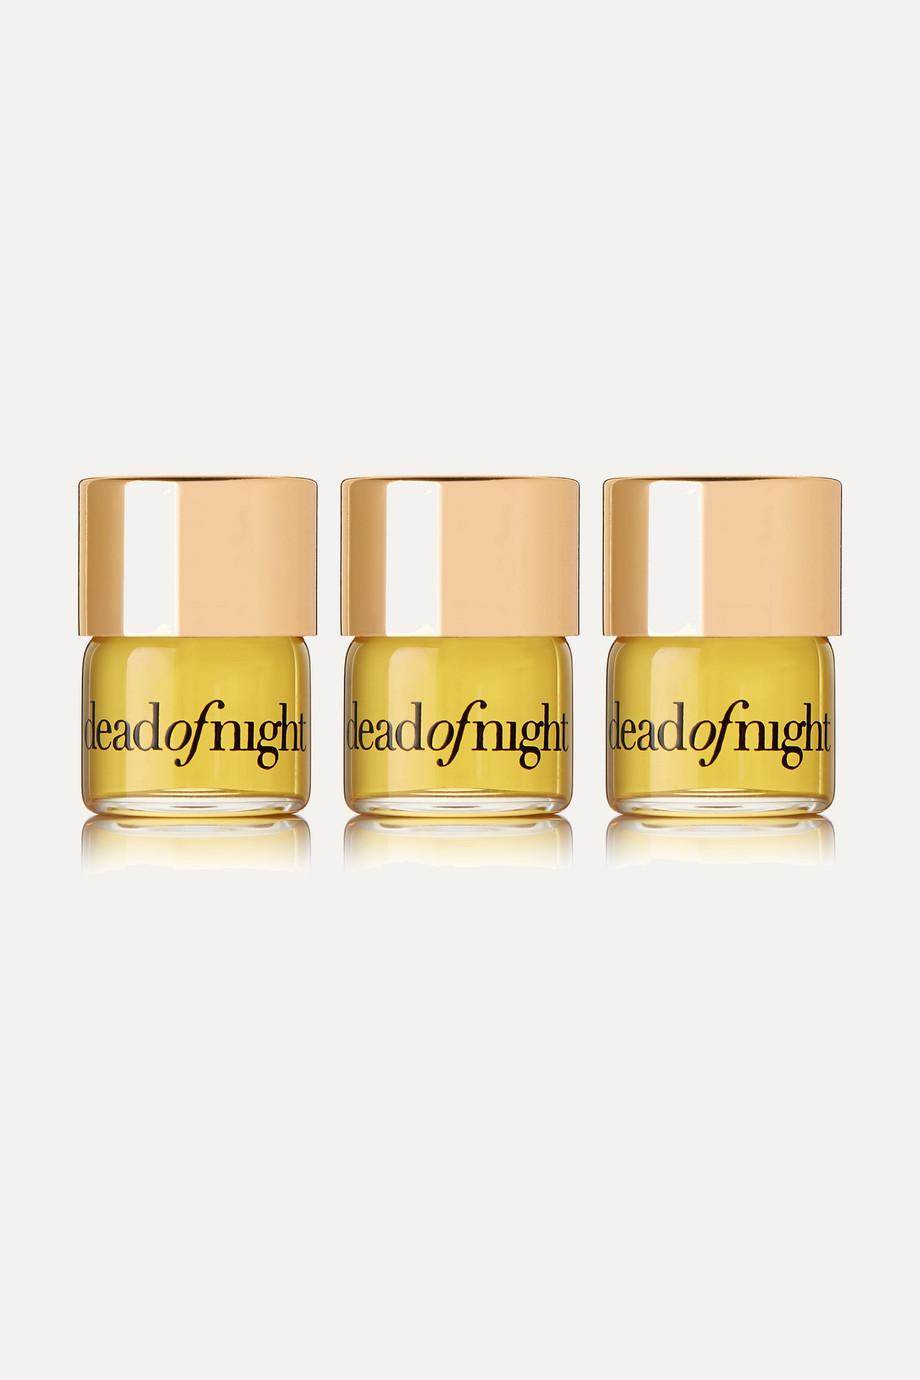 strangelove nyc Perfume Oil Travel Set - deadofnight, 3 x 1.25ml